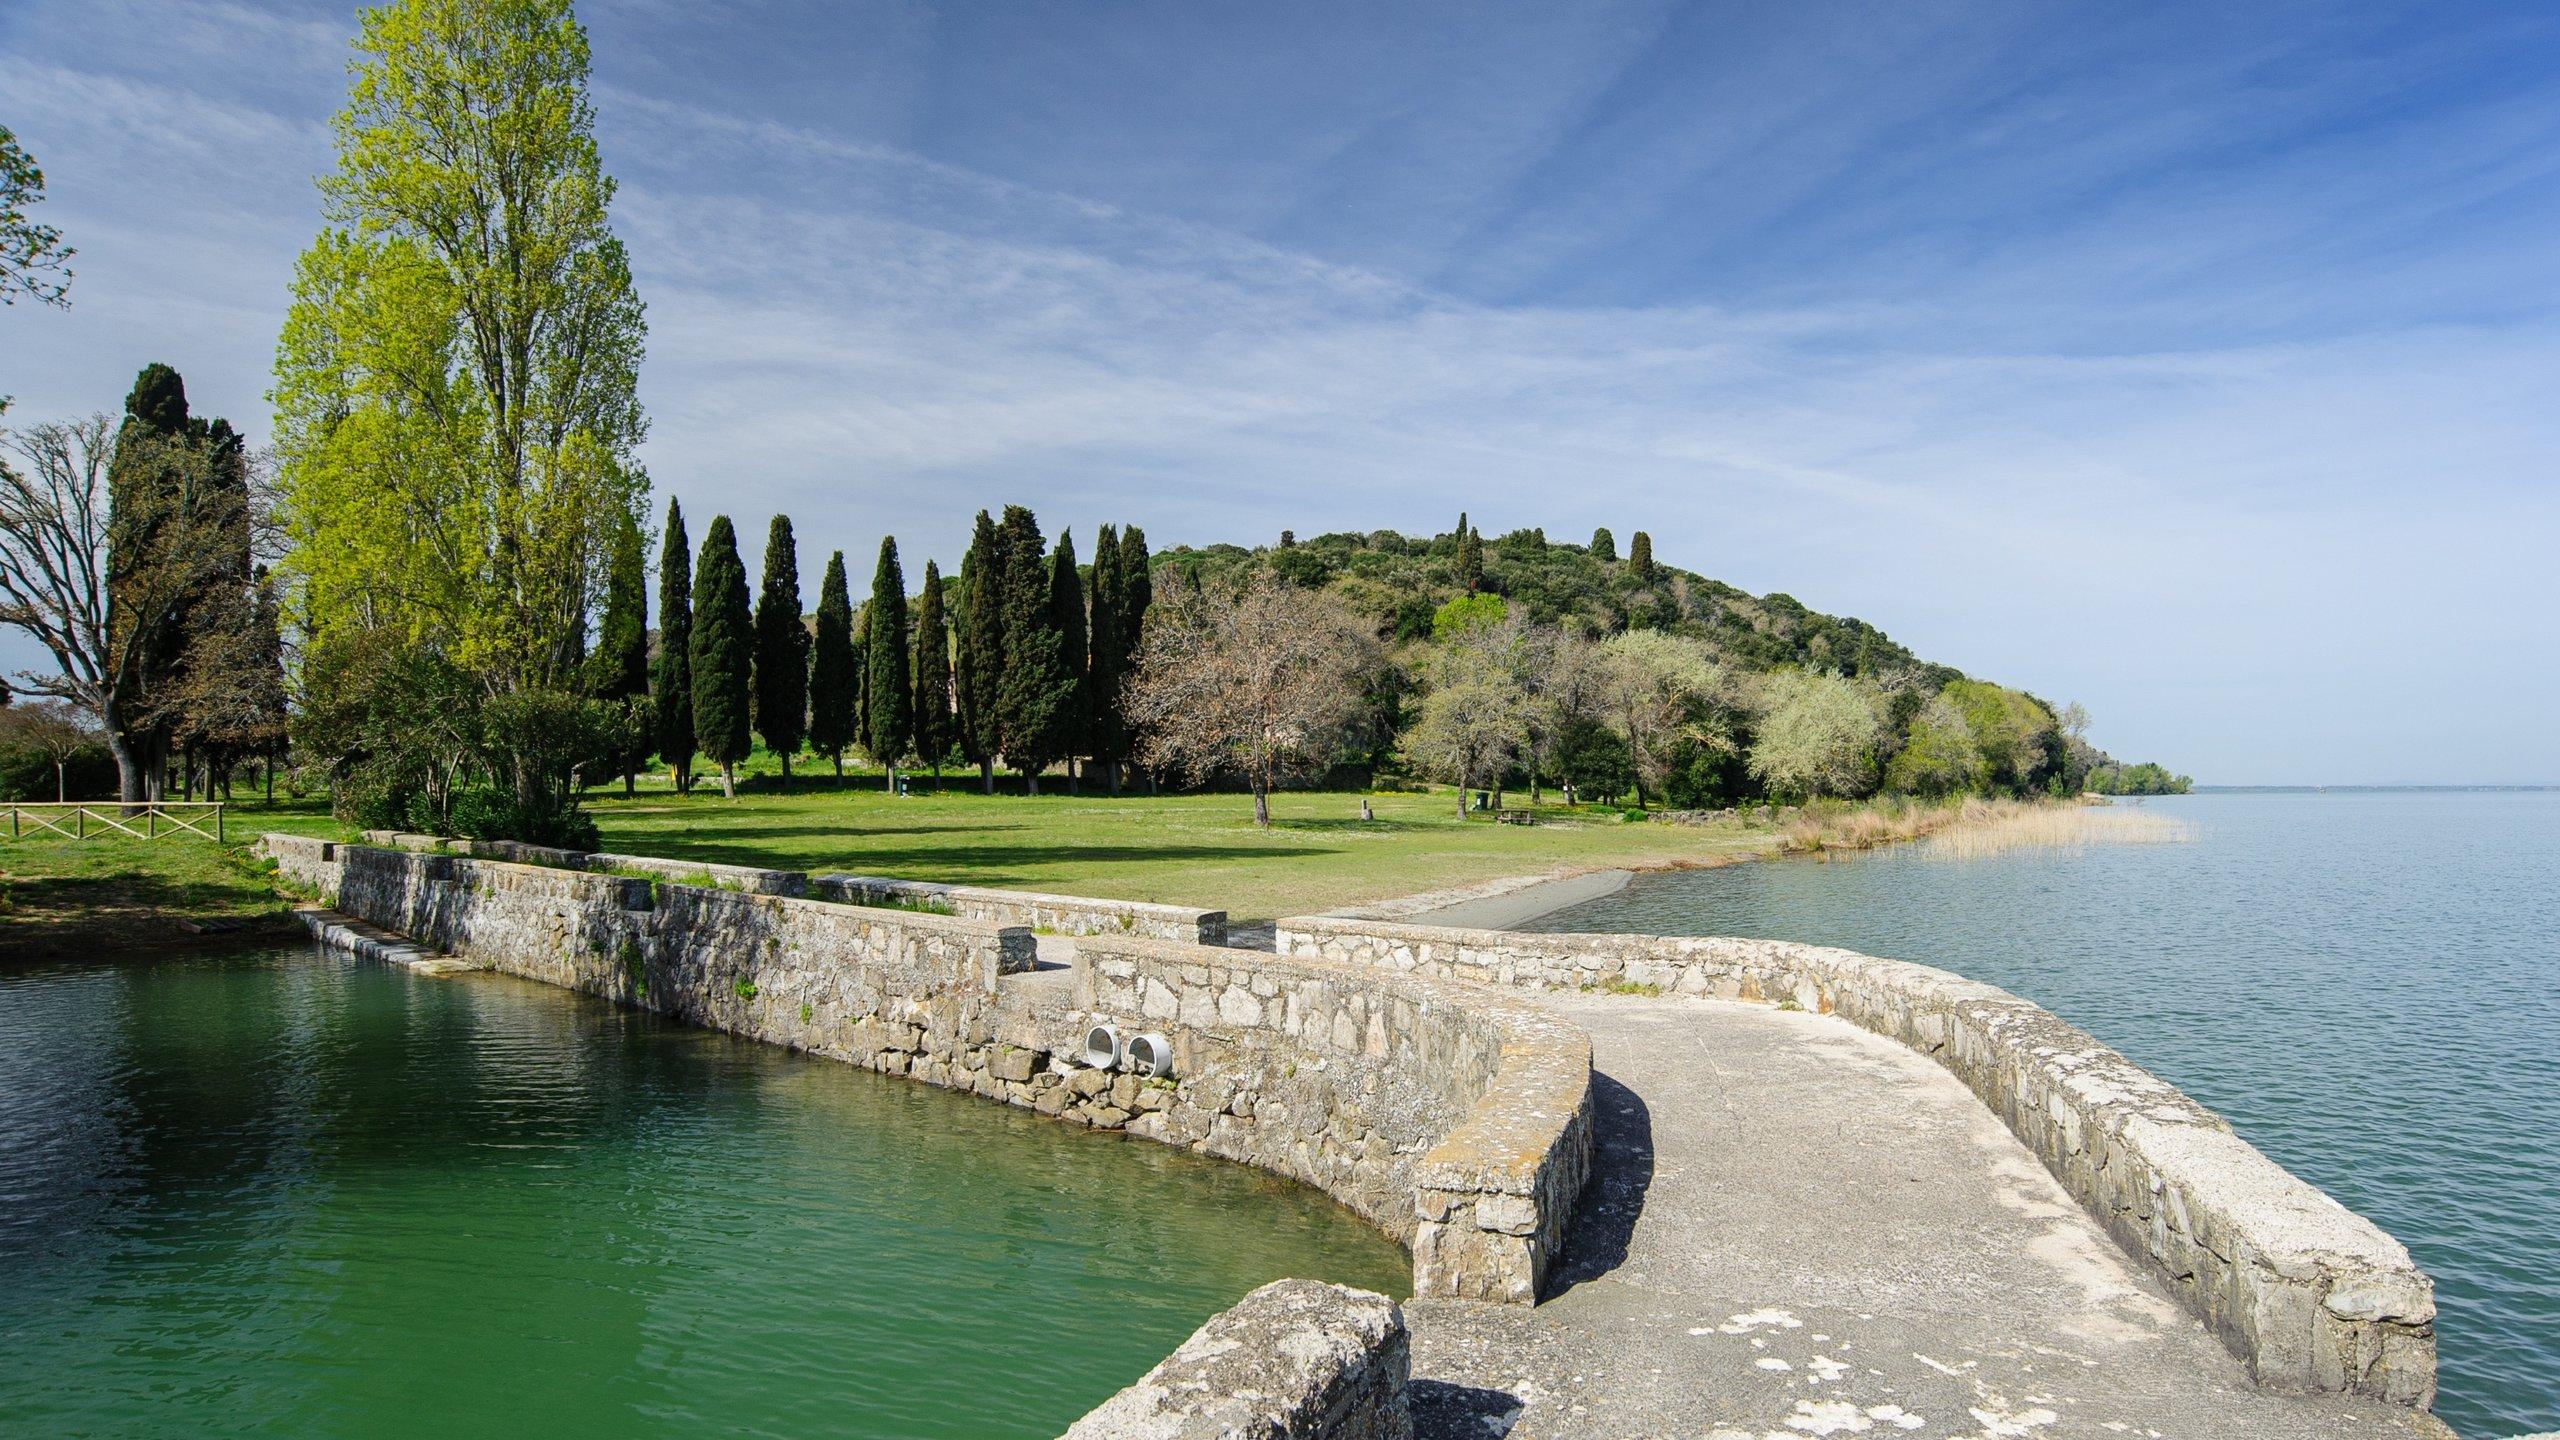 Trasimenischer See, Castiglione del Lago, Umbrien, Italien